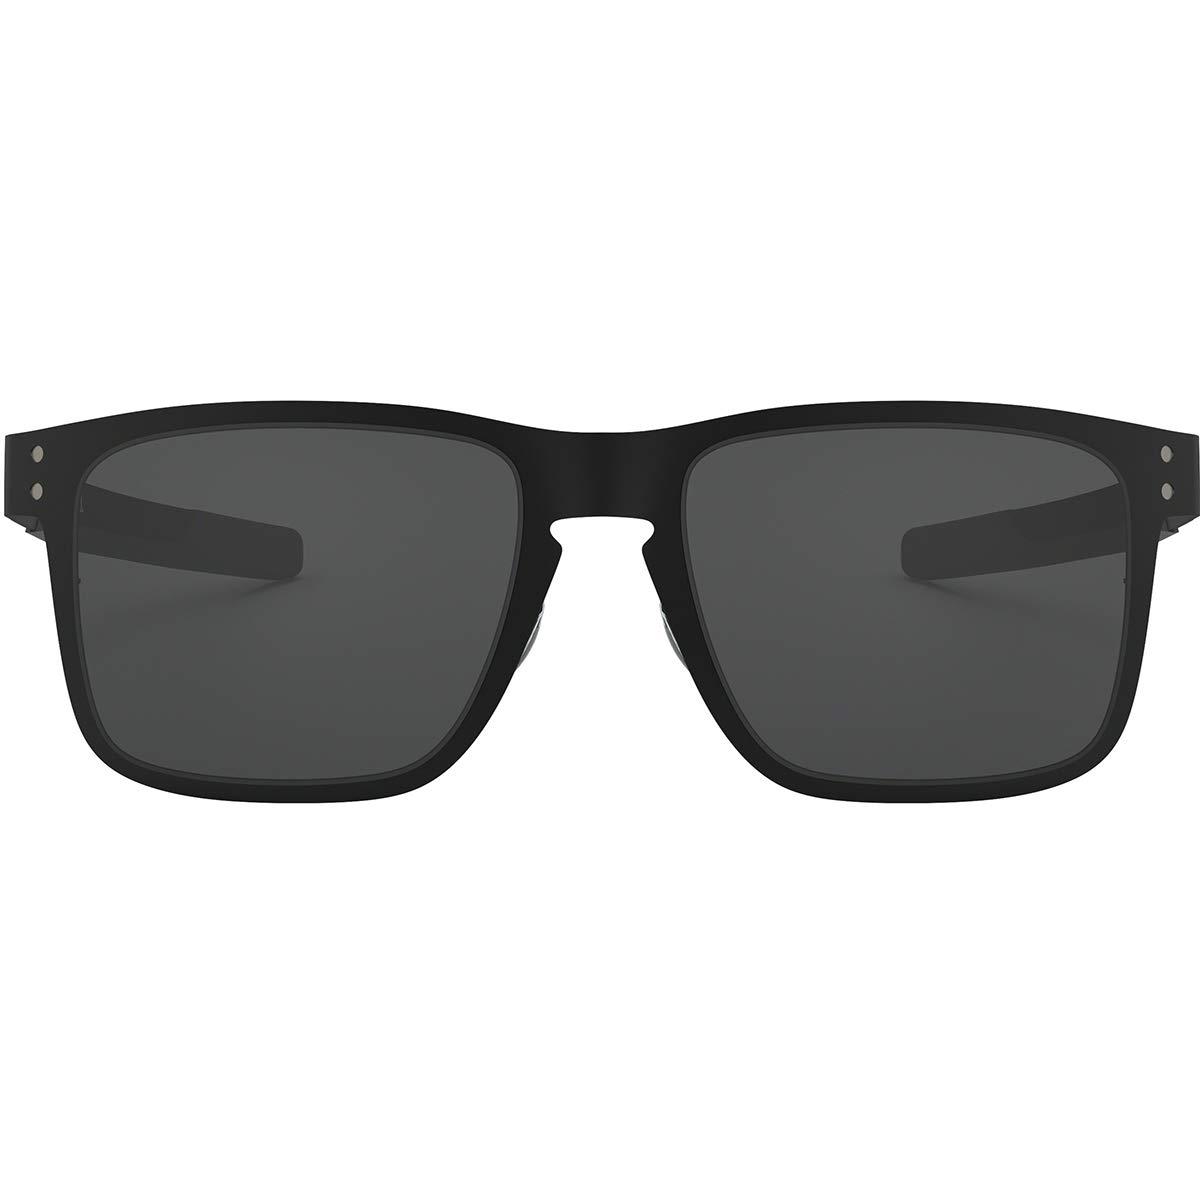 0bada9c1f0 Oakley Holbrook Metal Square Sunglasses